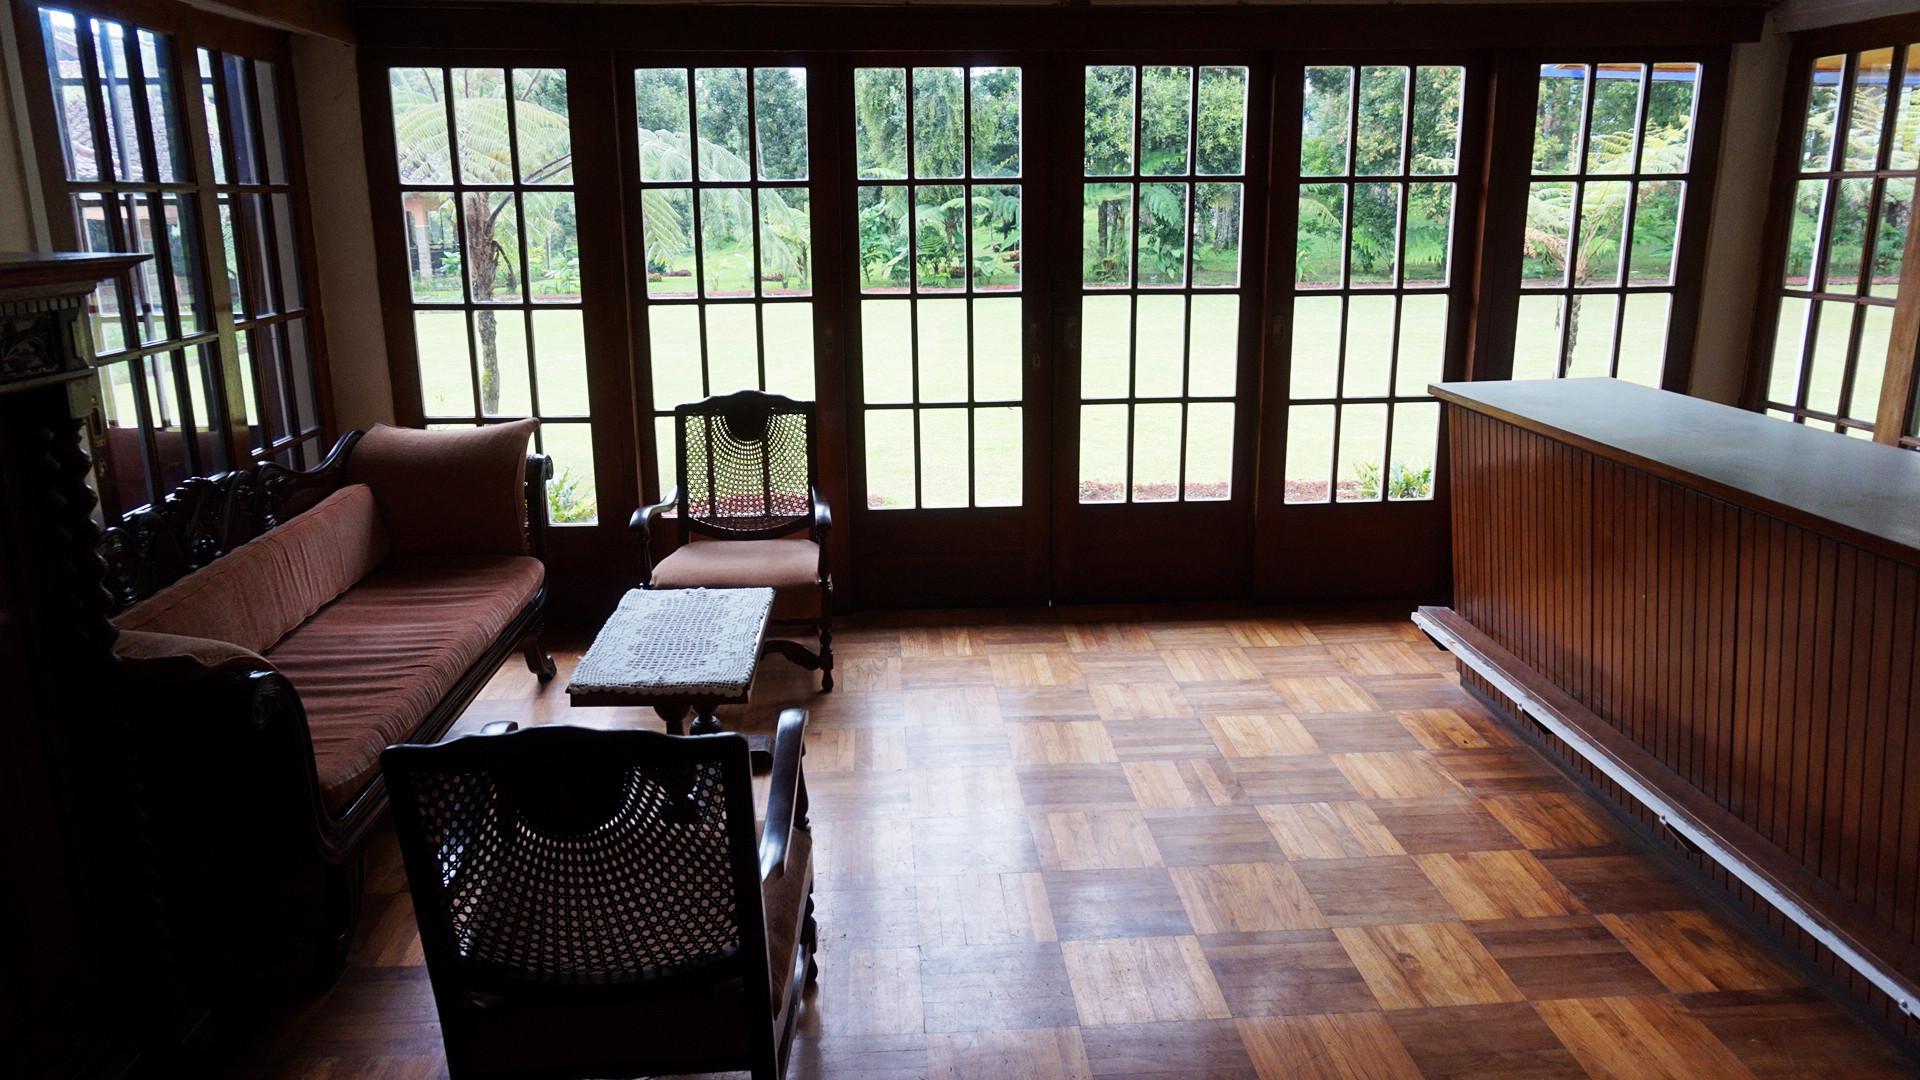 Sejumlah properti dari abad ke-18 dan 19 masih terawat dengan baik di rumah peninggalan Raja Teh Priangan, Karel Albert Rudolf Bosscha, di Pangalengan, Kabupaten Bandung, Jawa Barat. (Liputan6.com/Huyogo Simbolon)